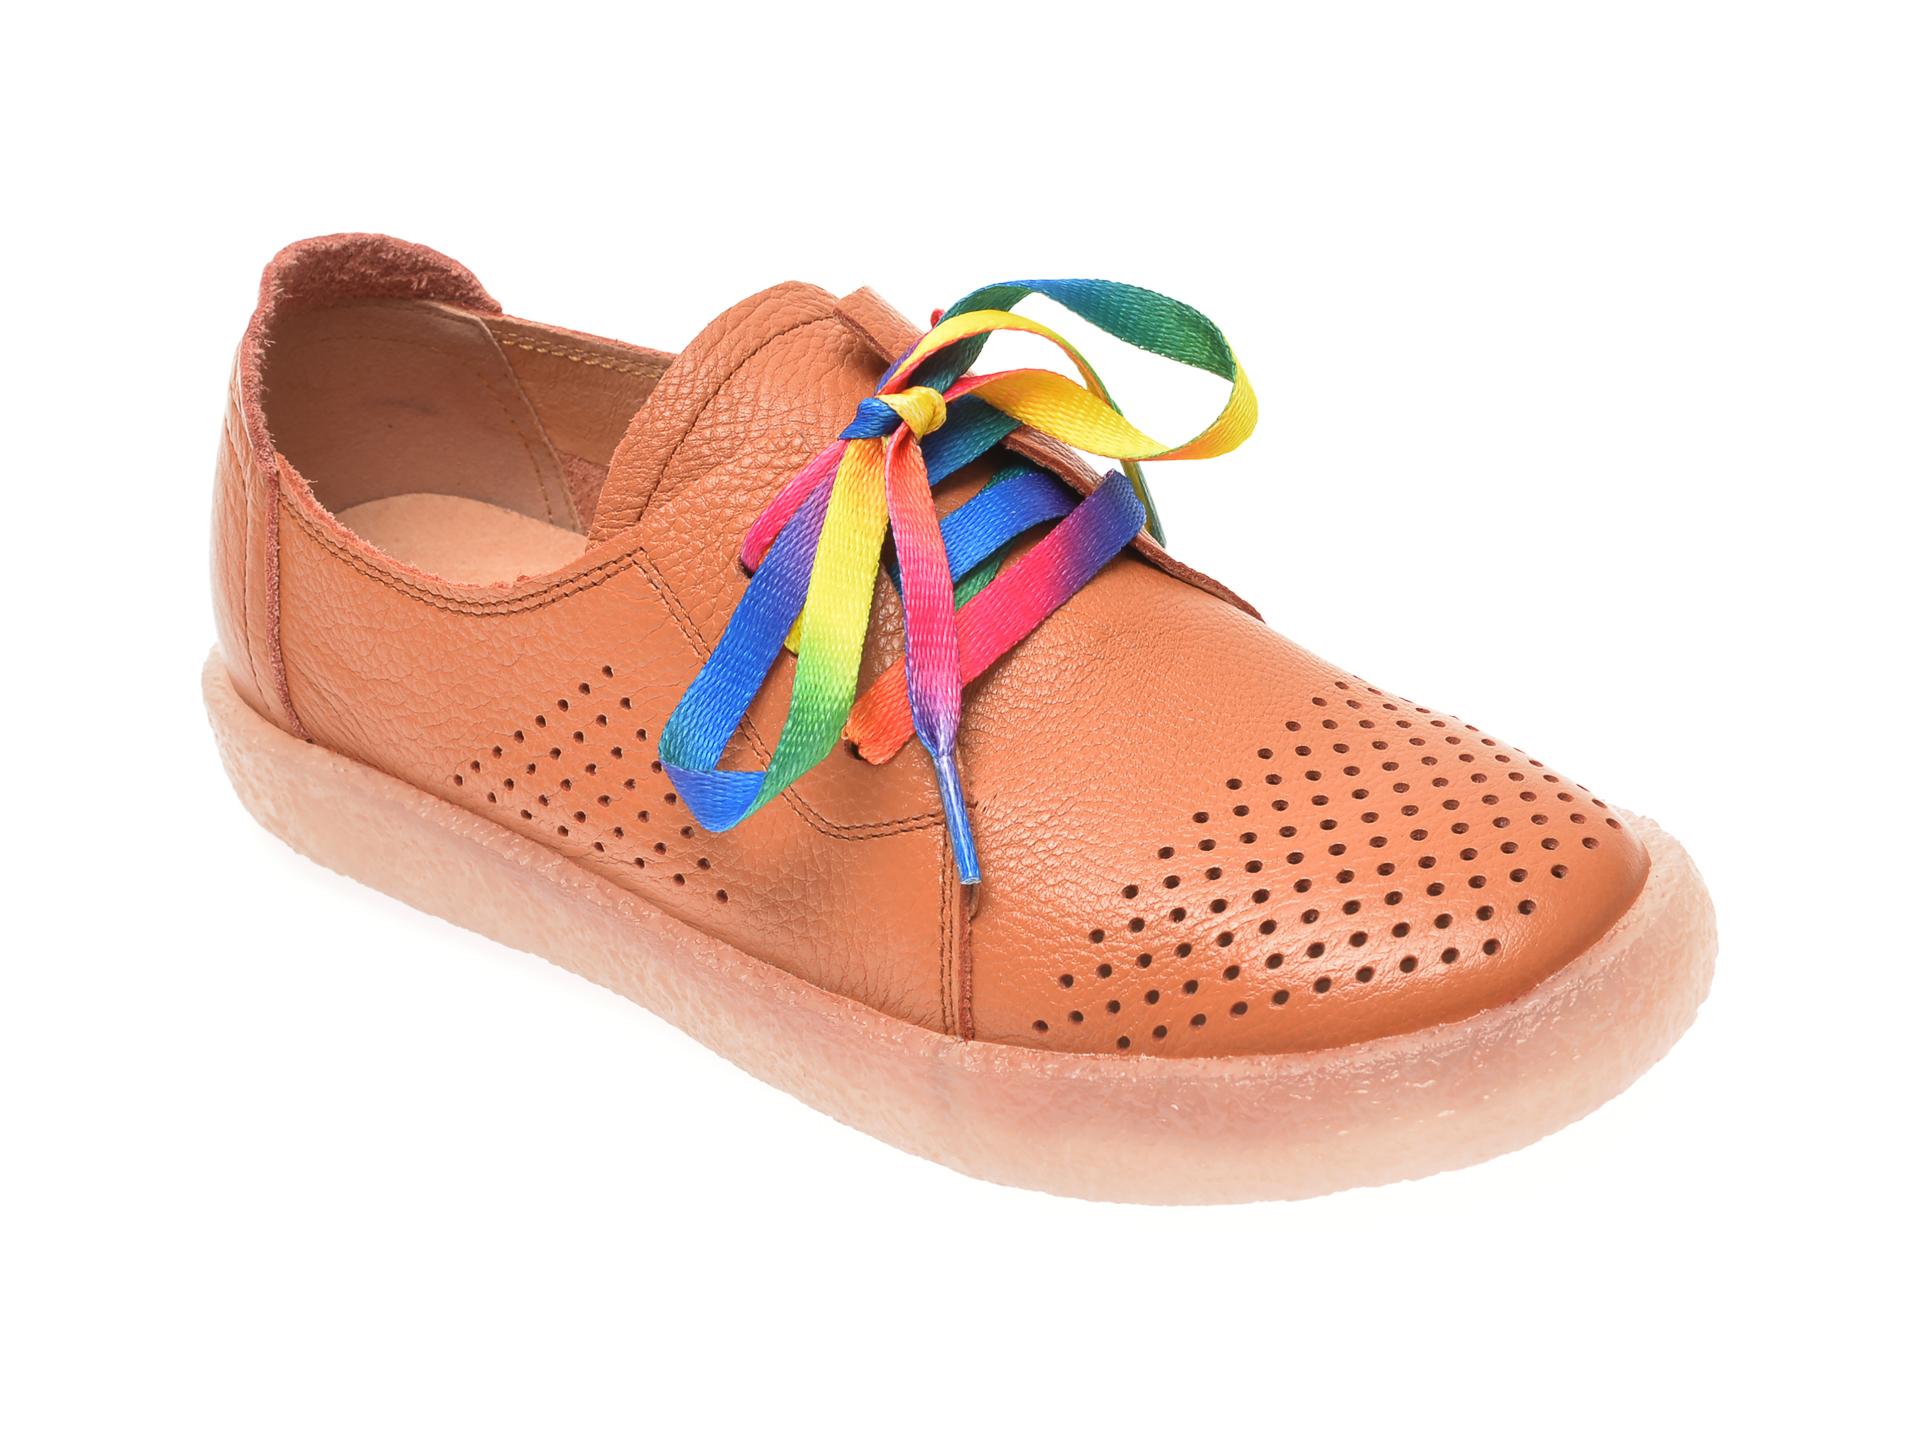 Pantofi PASS COLLECTION maro, T9019, din piele naturala